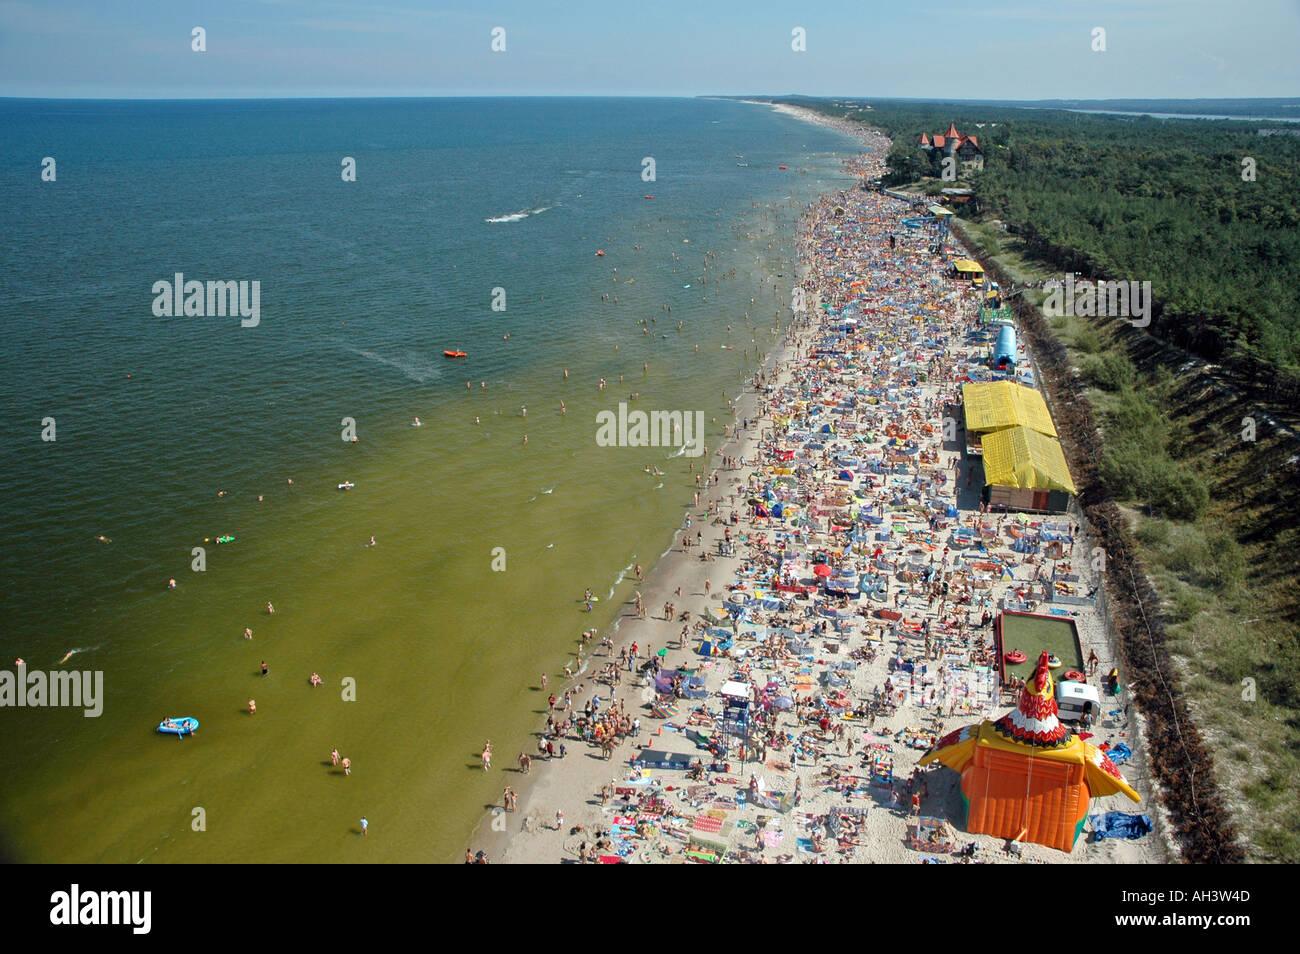 Crowded Beach In Leba Poland Stock Photo Royalty Free